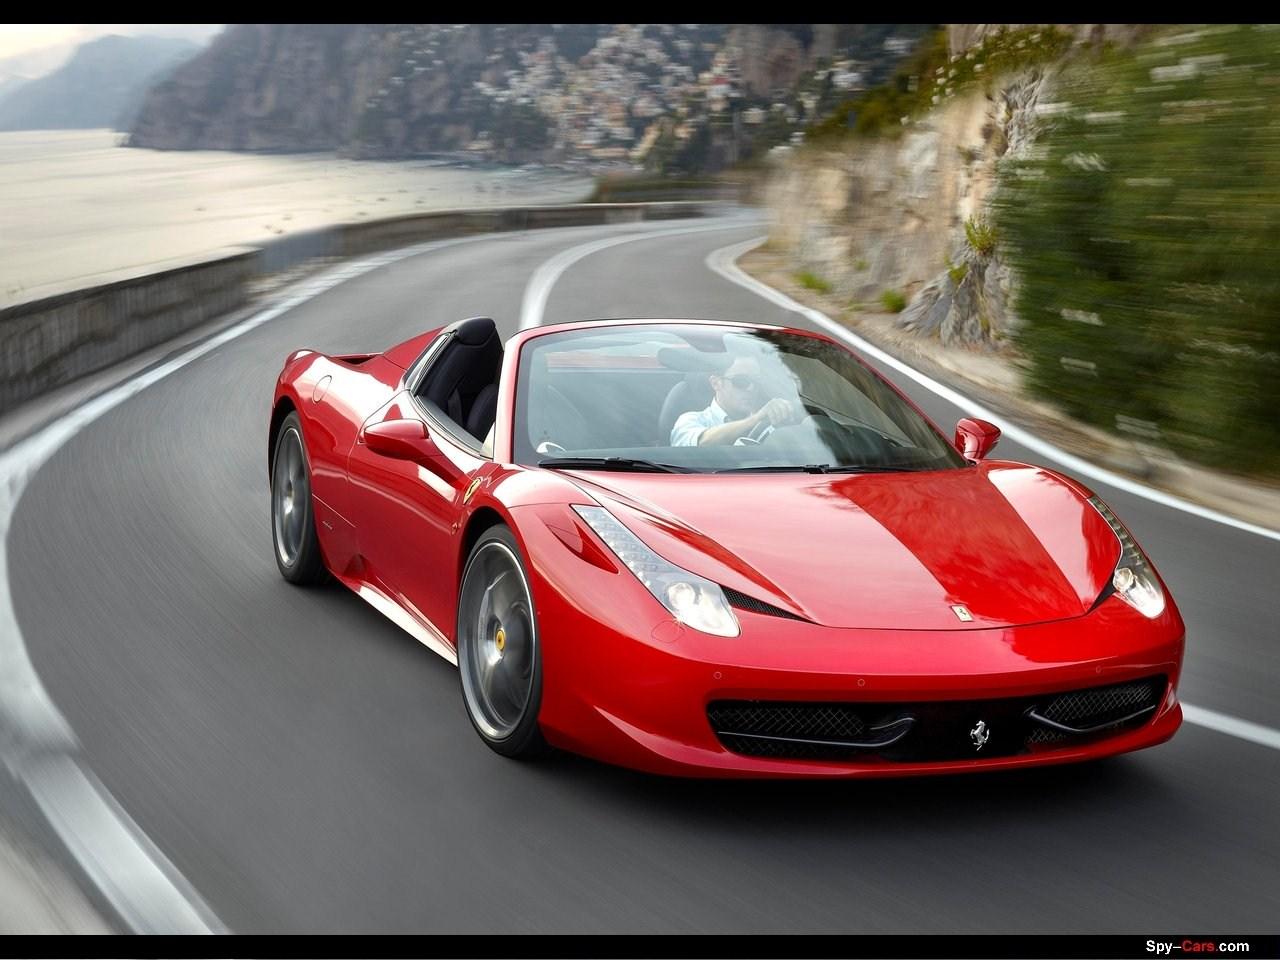 2013 ferrari 458 spider ferrari autos spain. Cars Review. Best American Auto & Cars Review